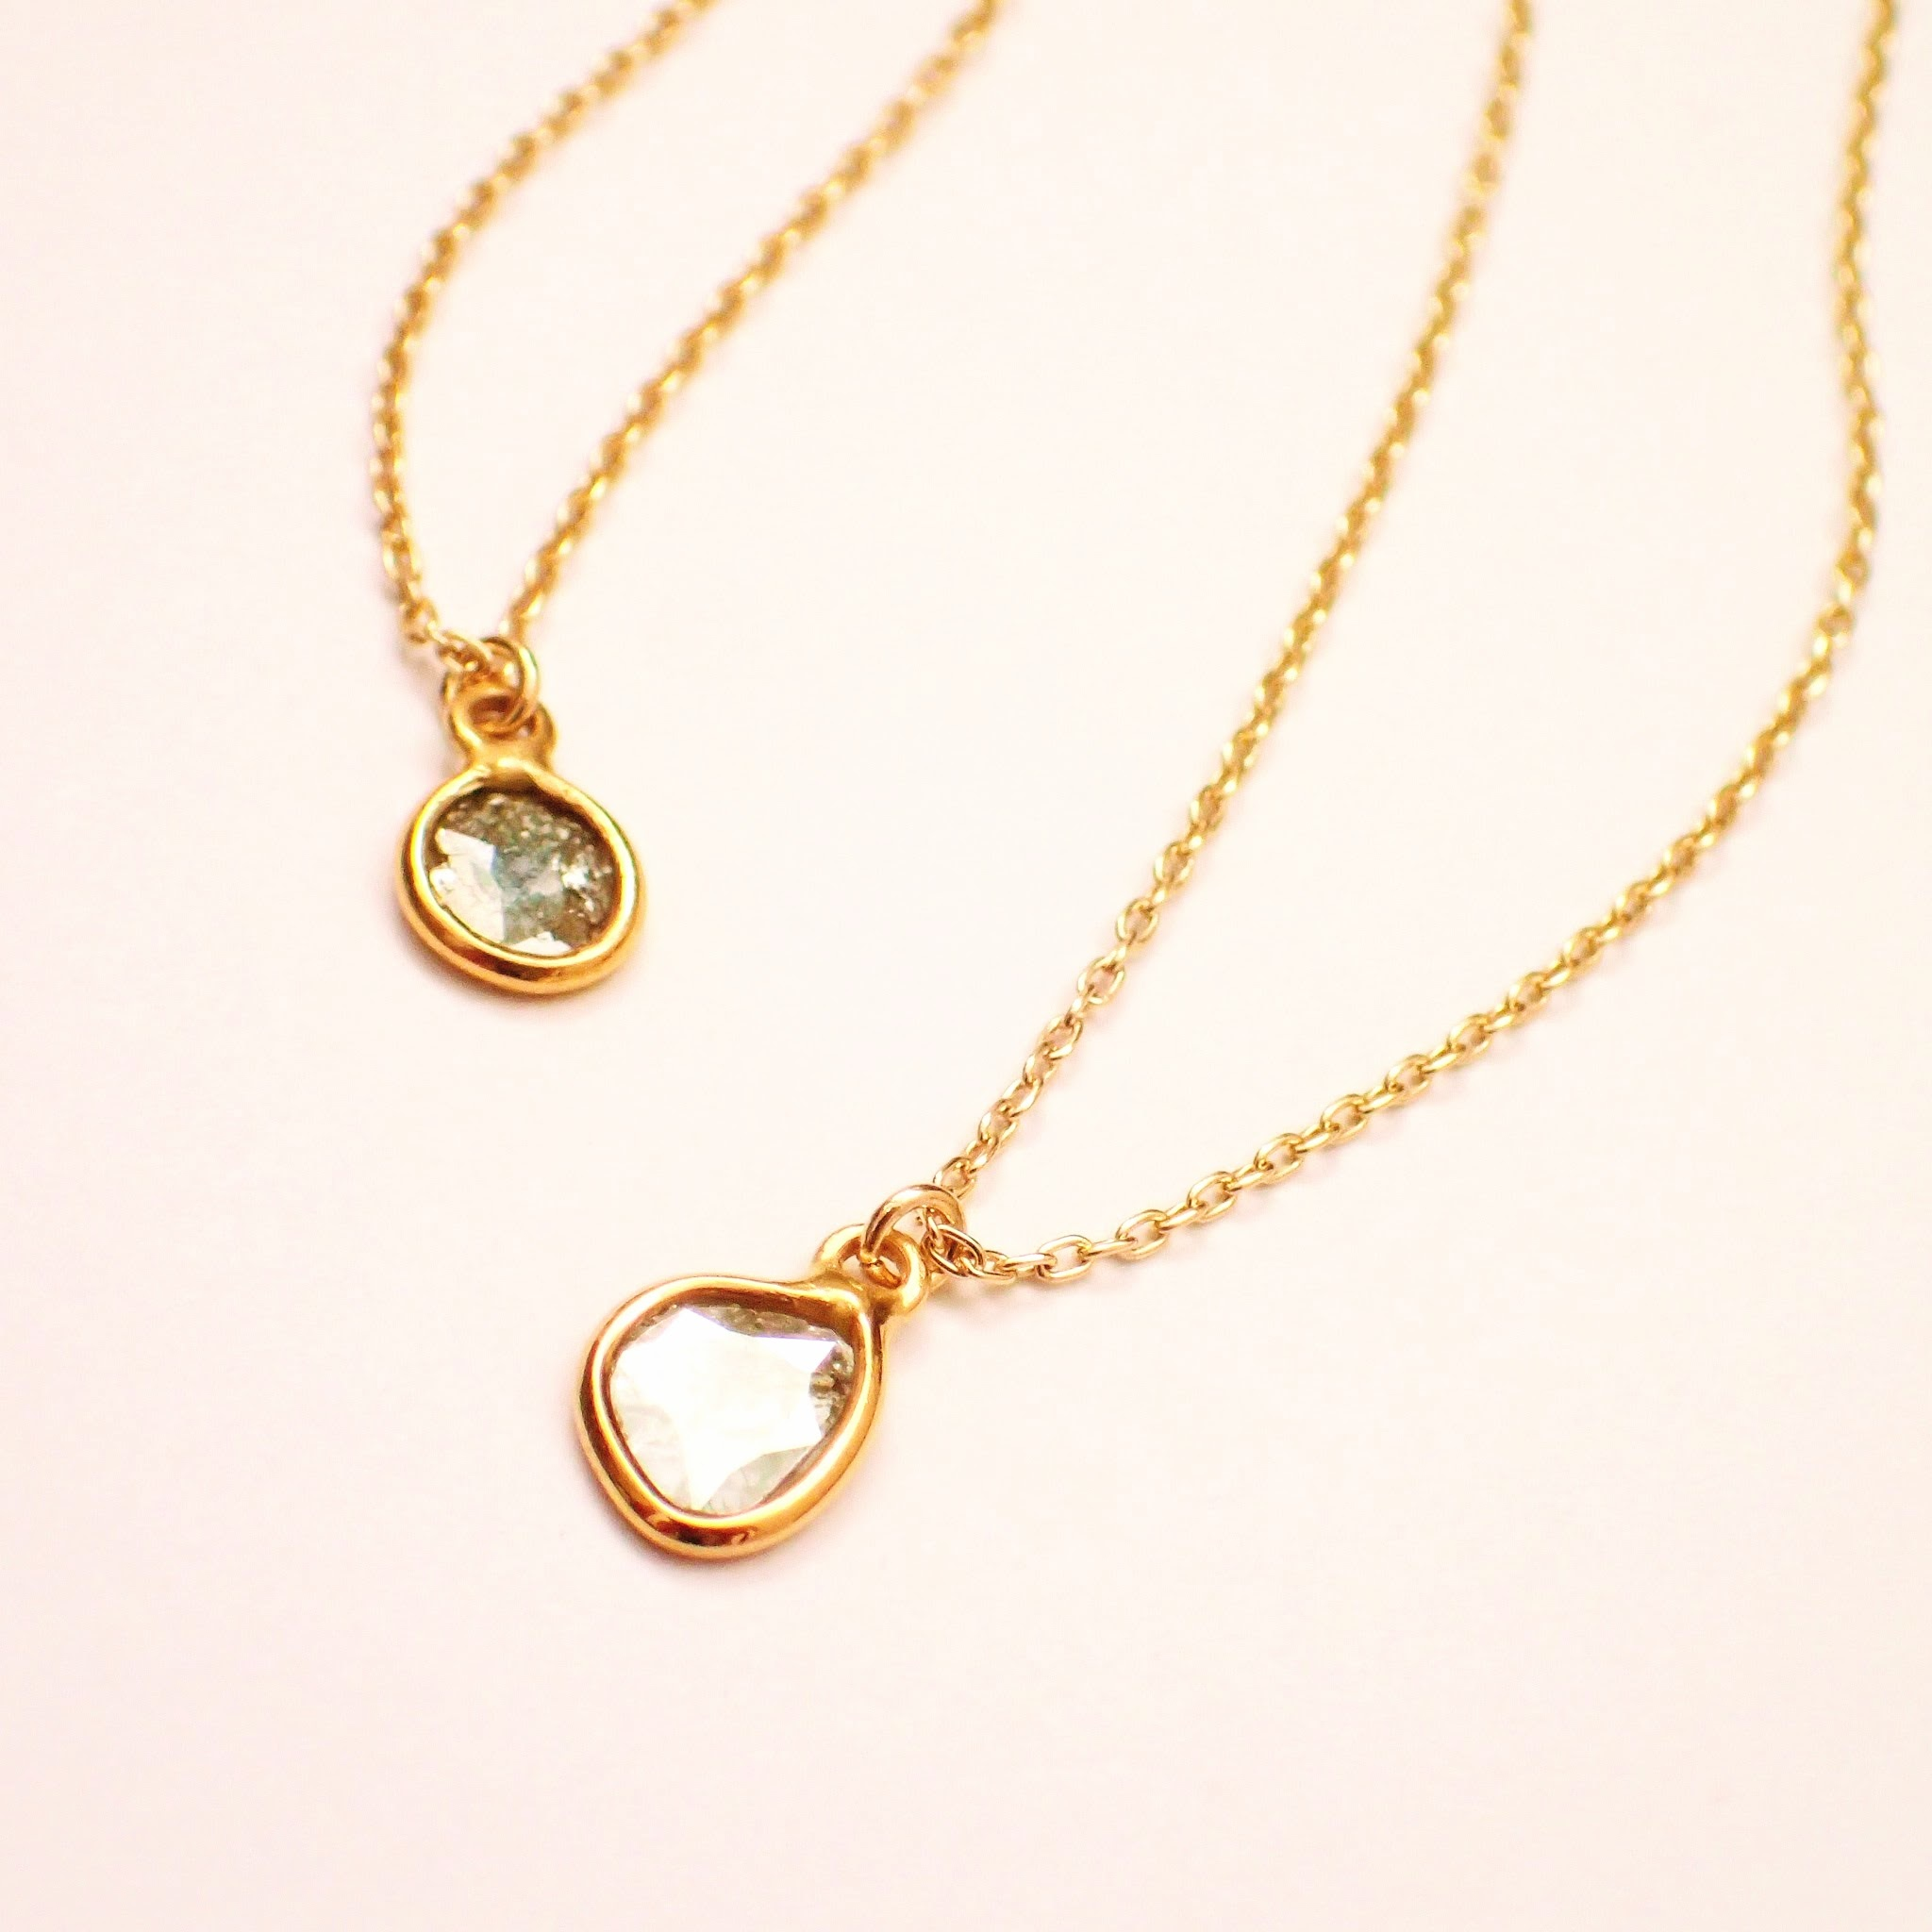 k18 原石 ダイヤモンド ネックレス